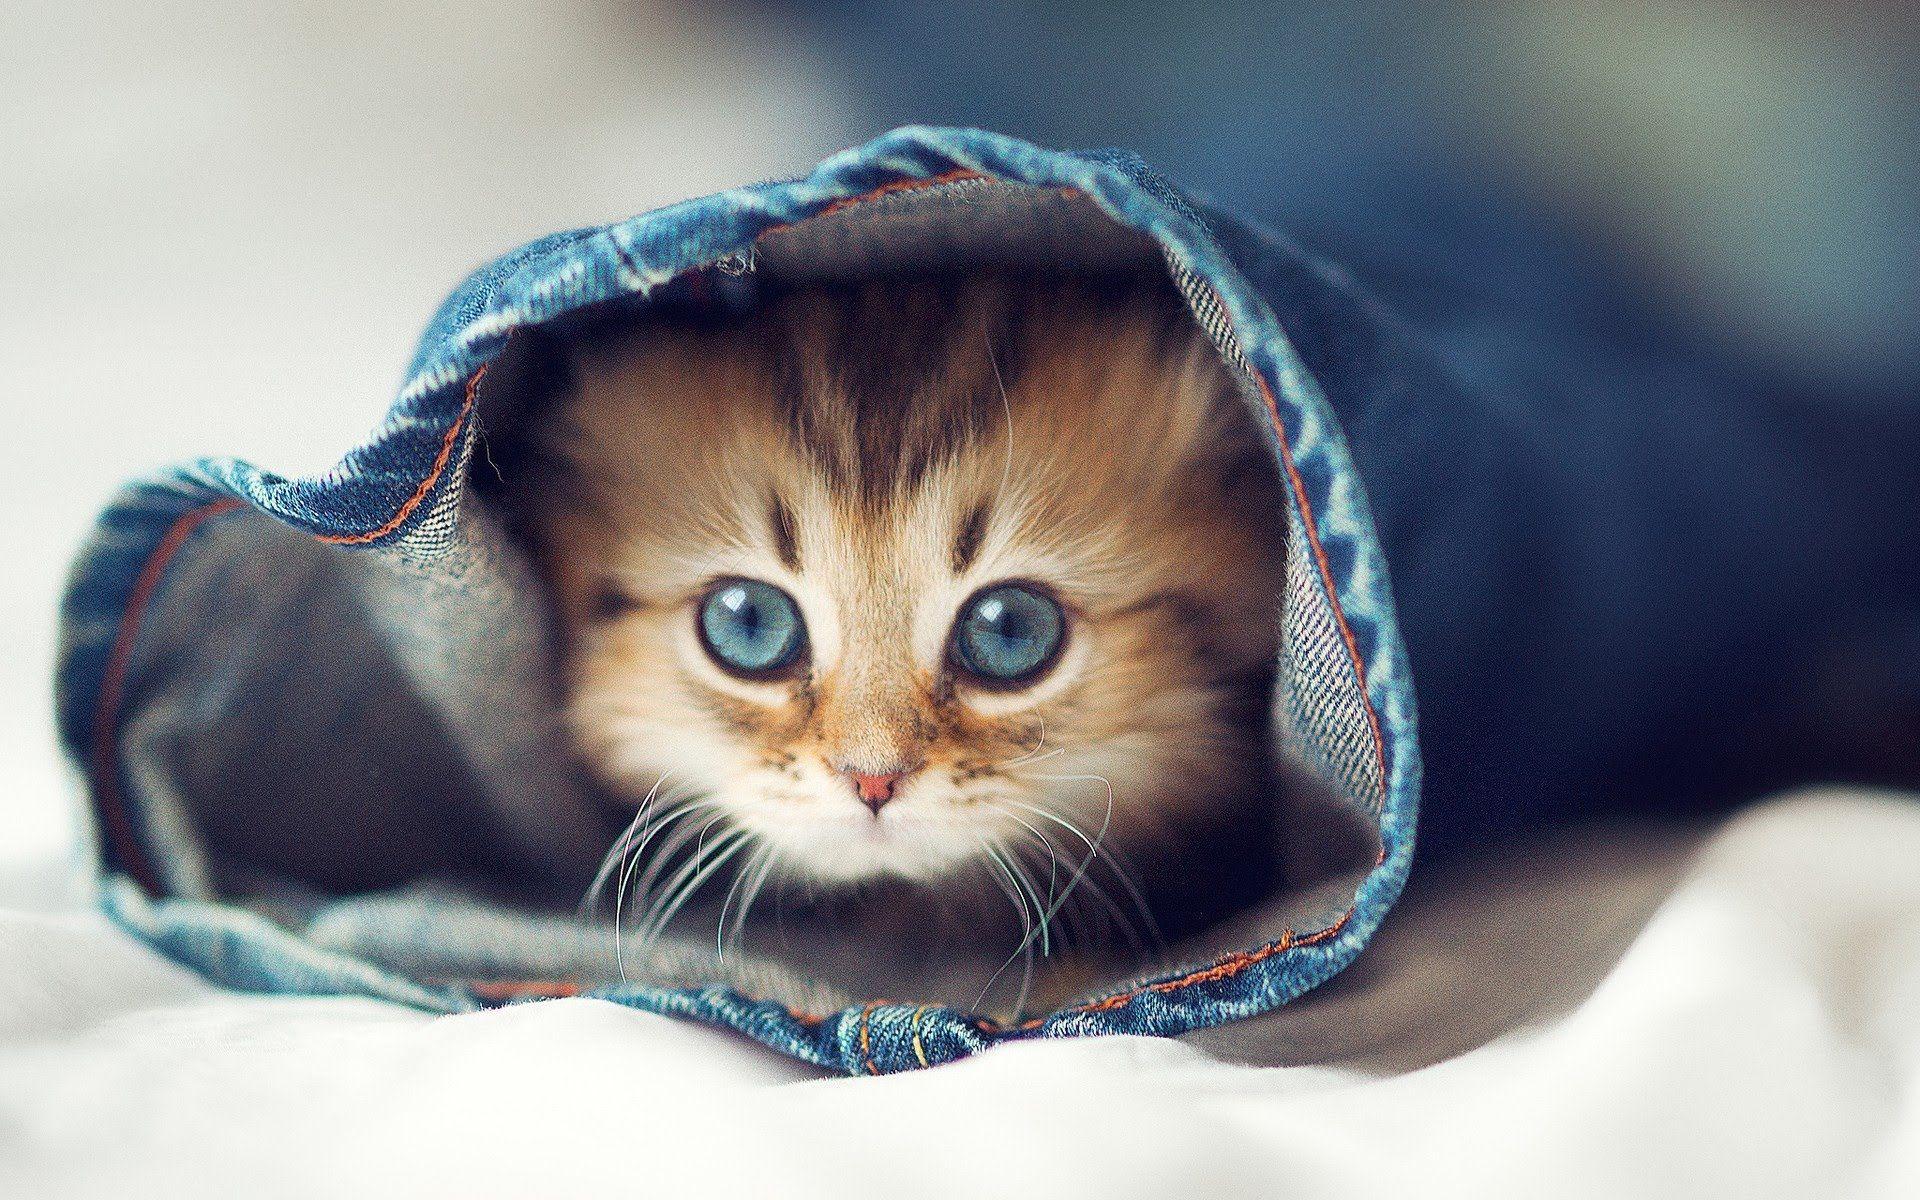 Pin On Cute Stuff Animals